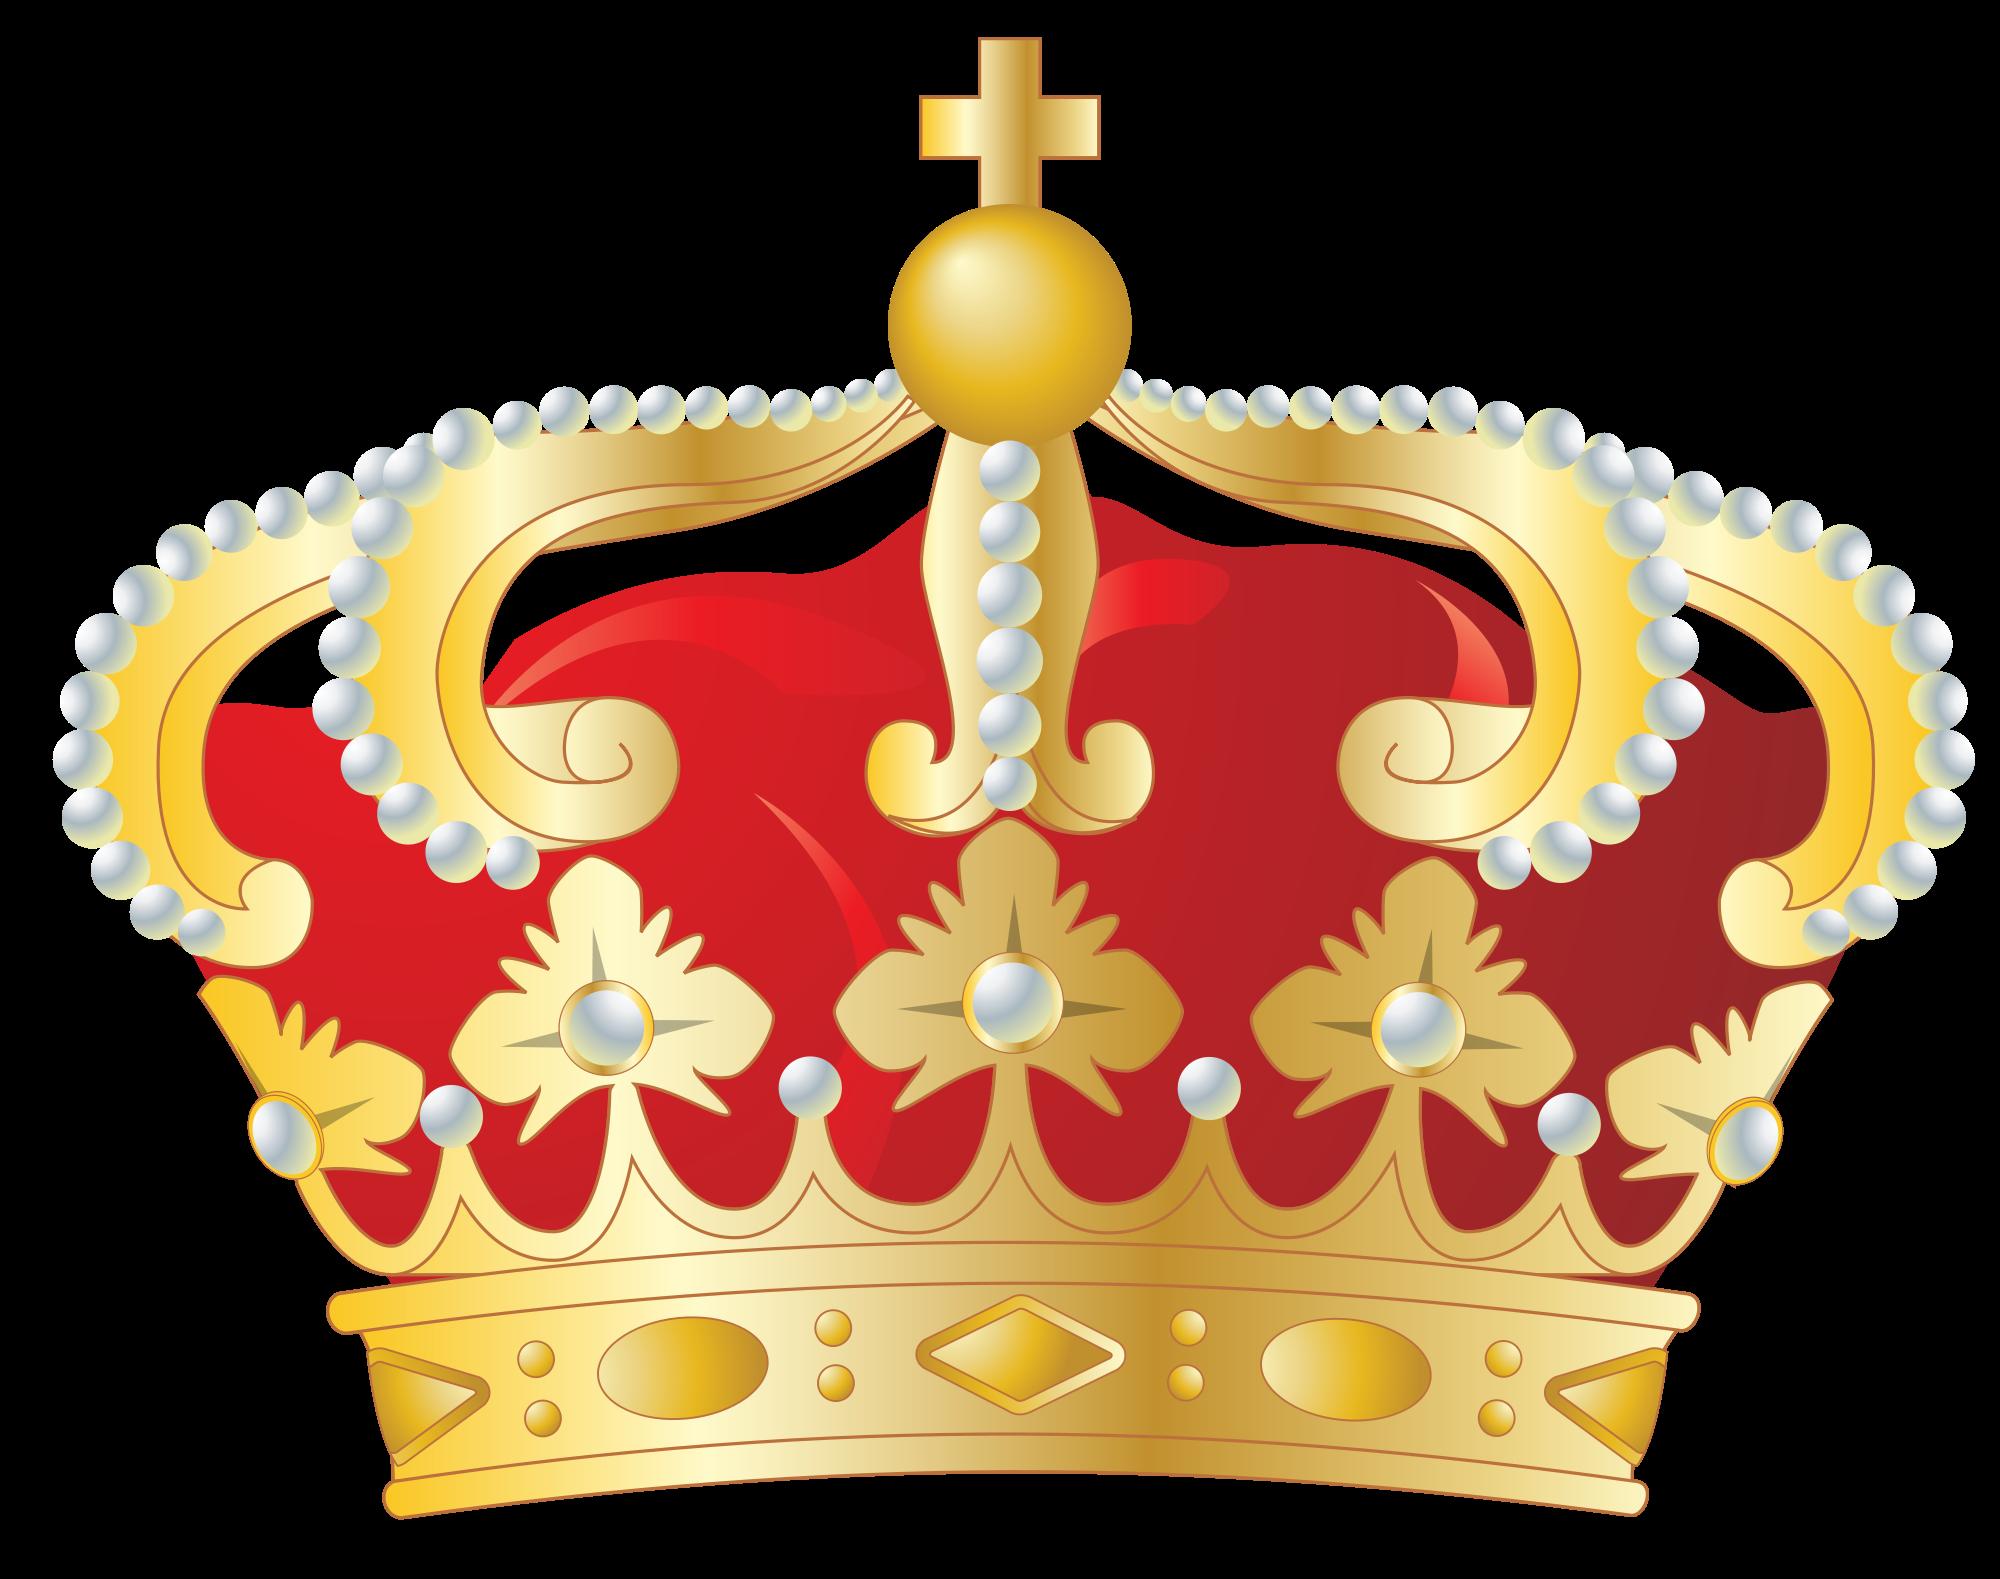 Macbeth theme by sagan. King clipart king duncan